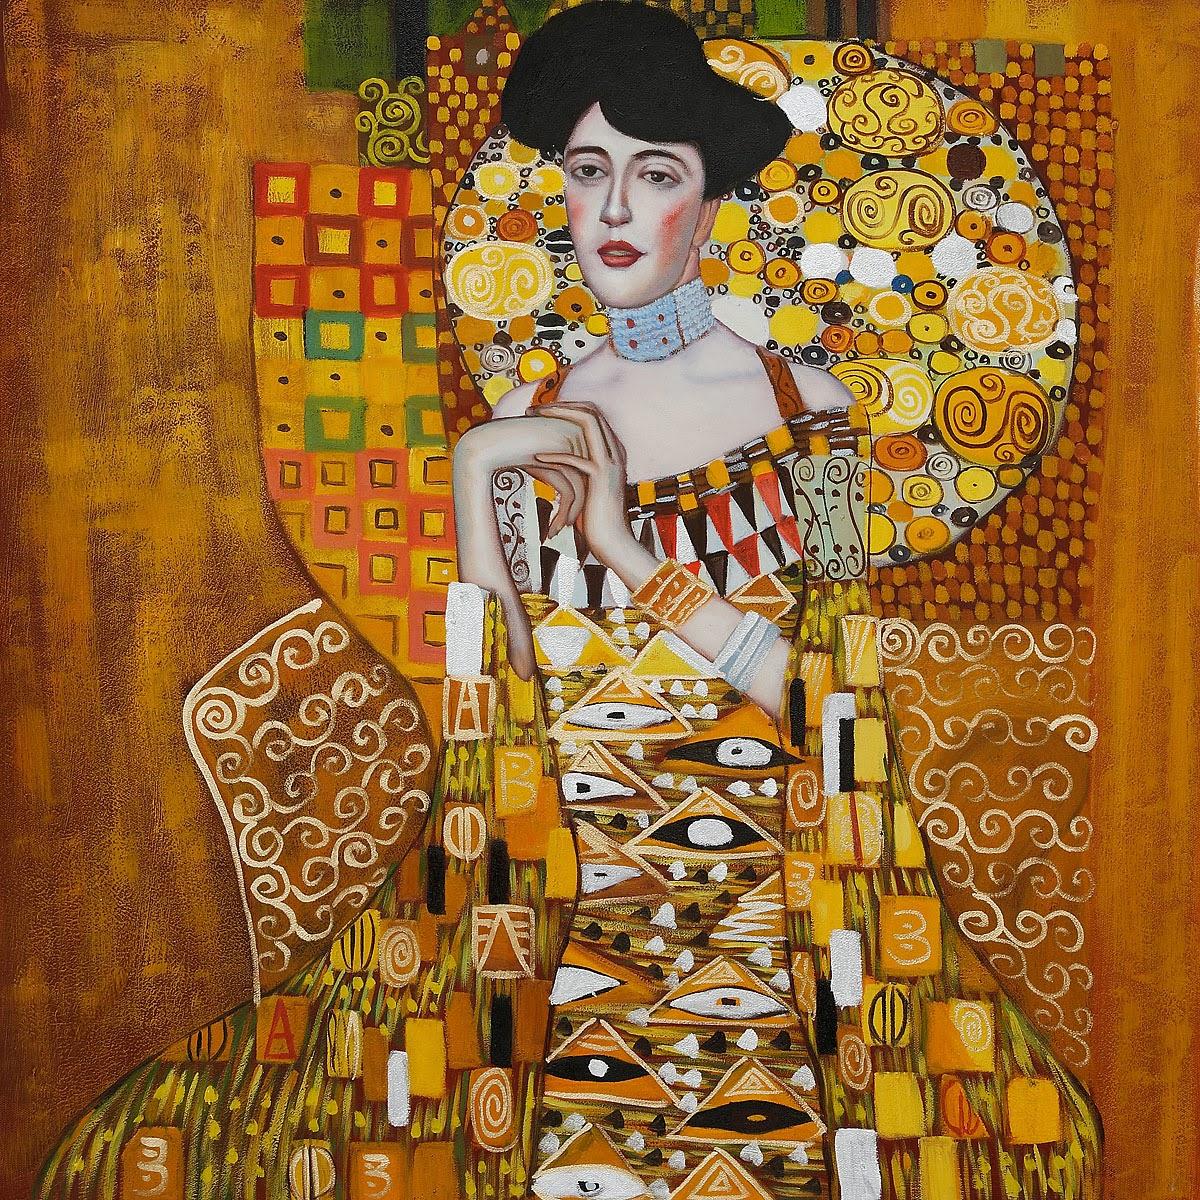 Vilt og vakkert kunstneren andrey remnev for Adele bloch bauer i